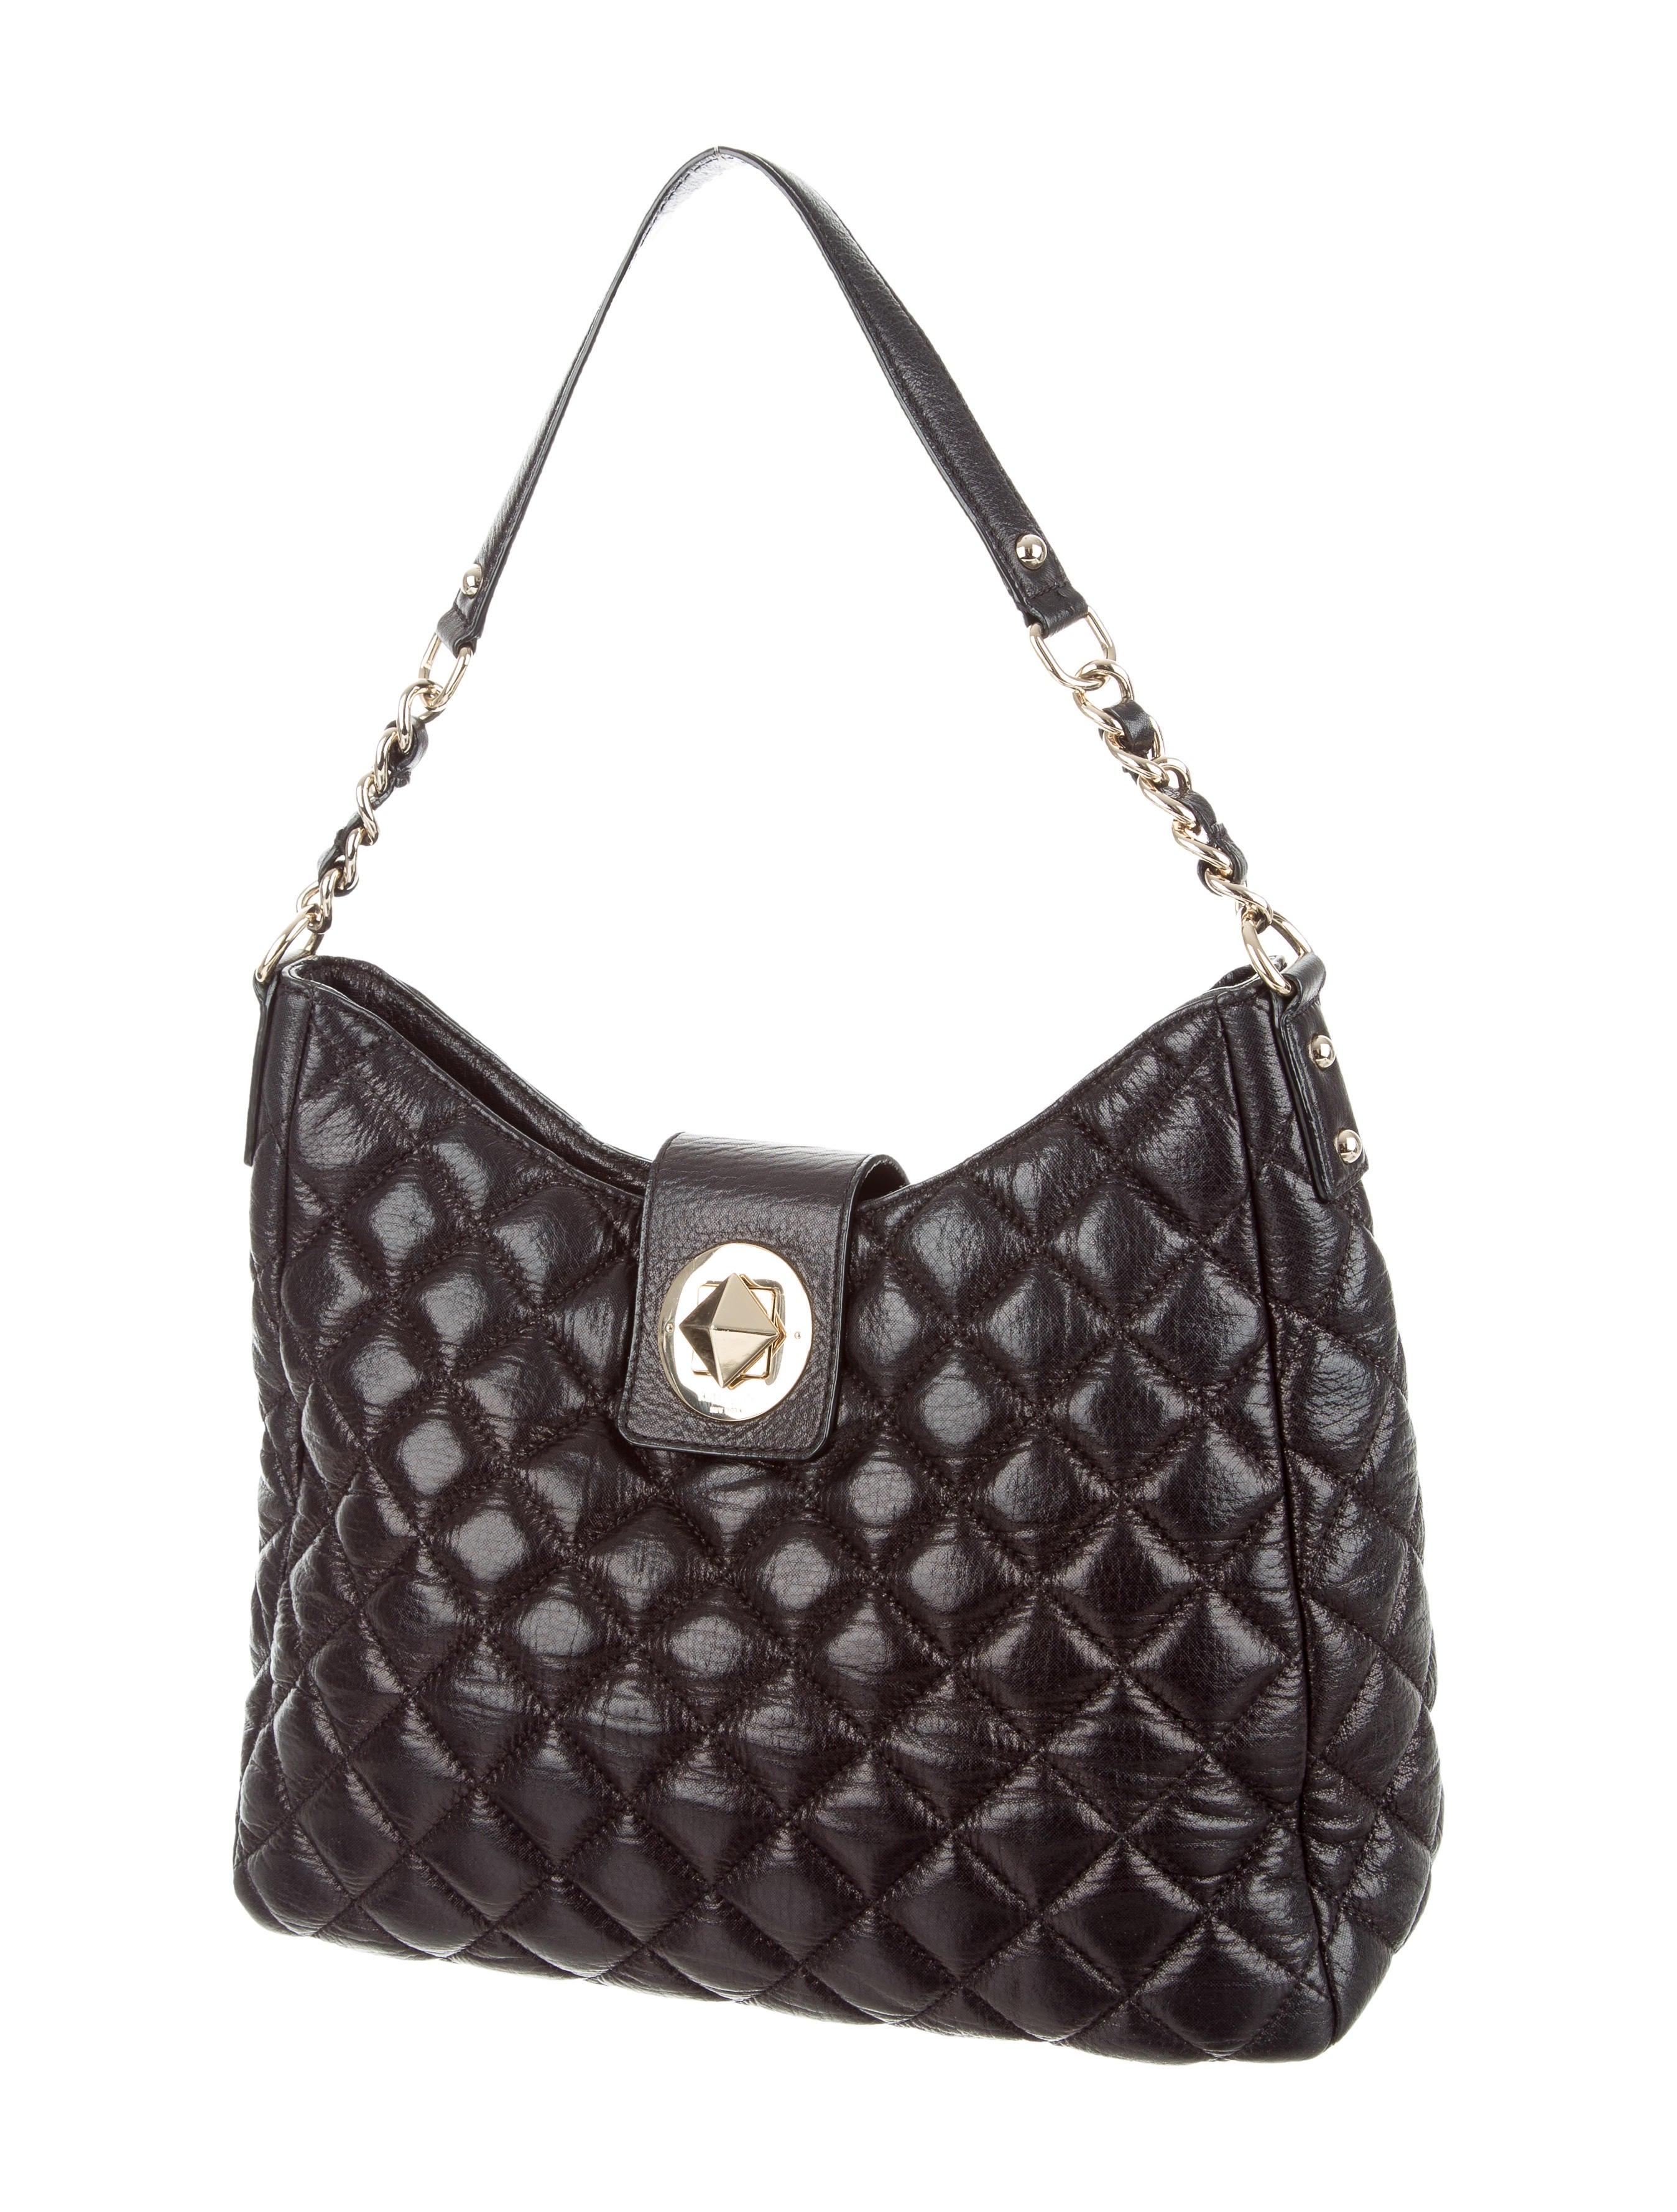 Kate Spade New York Gold Coast Janica Bag Handbags  : WKA611803enlarged from www.therealreal.com size 2697 x 3558 jpeg 773kB